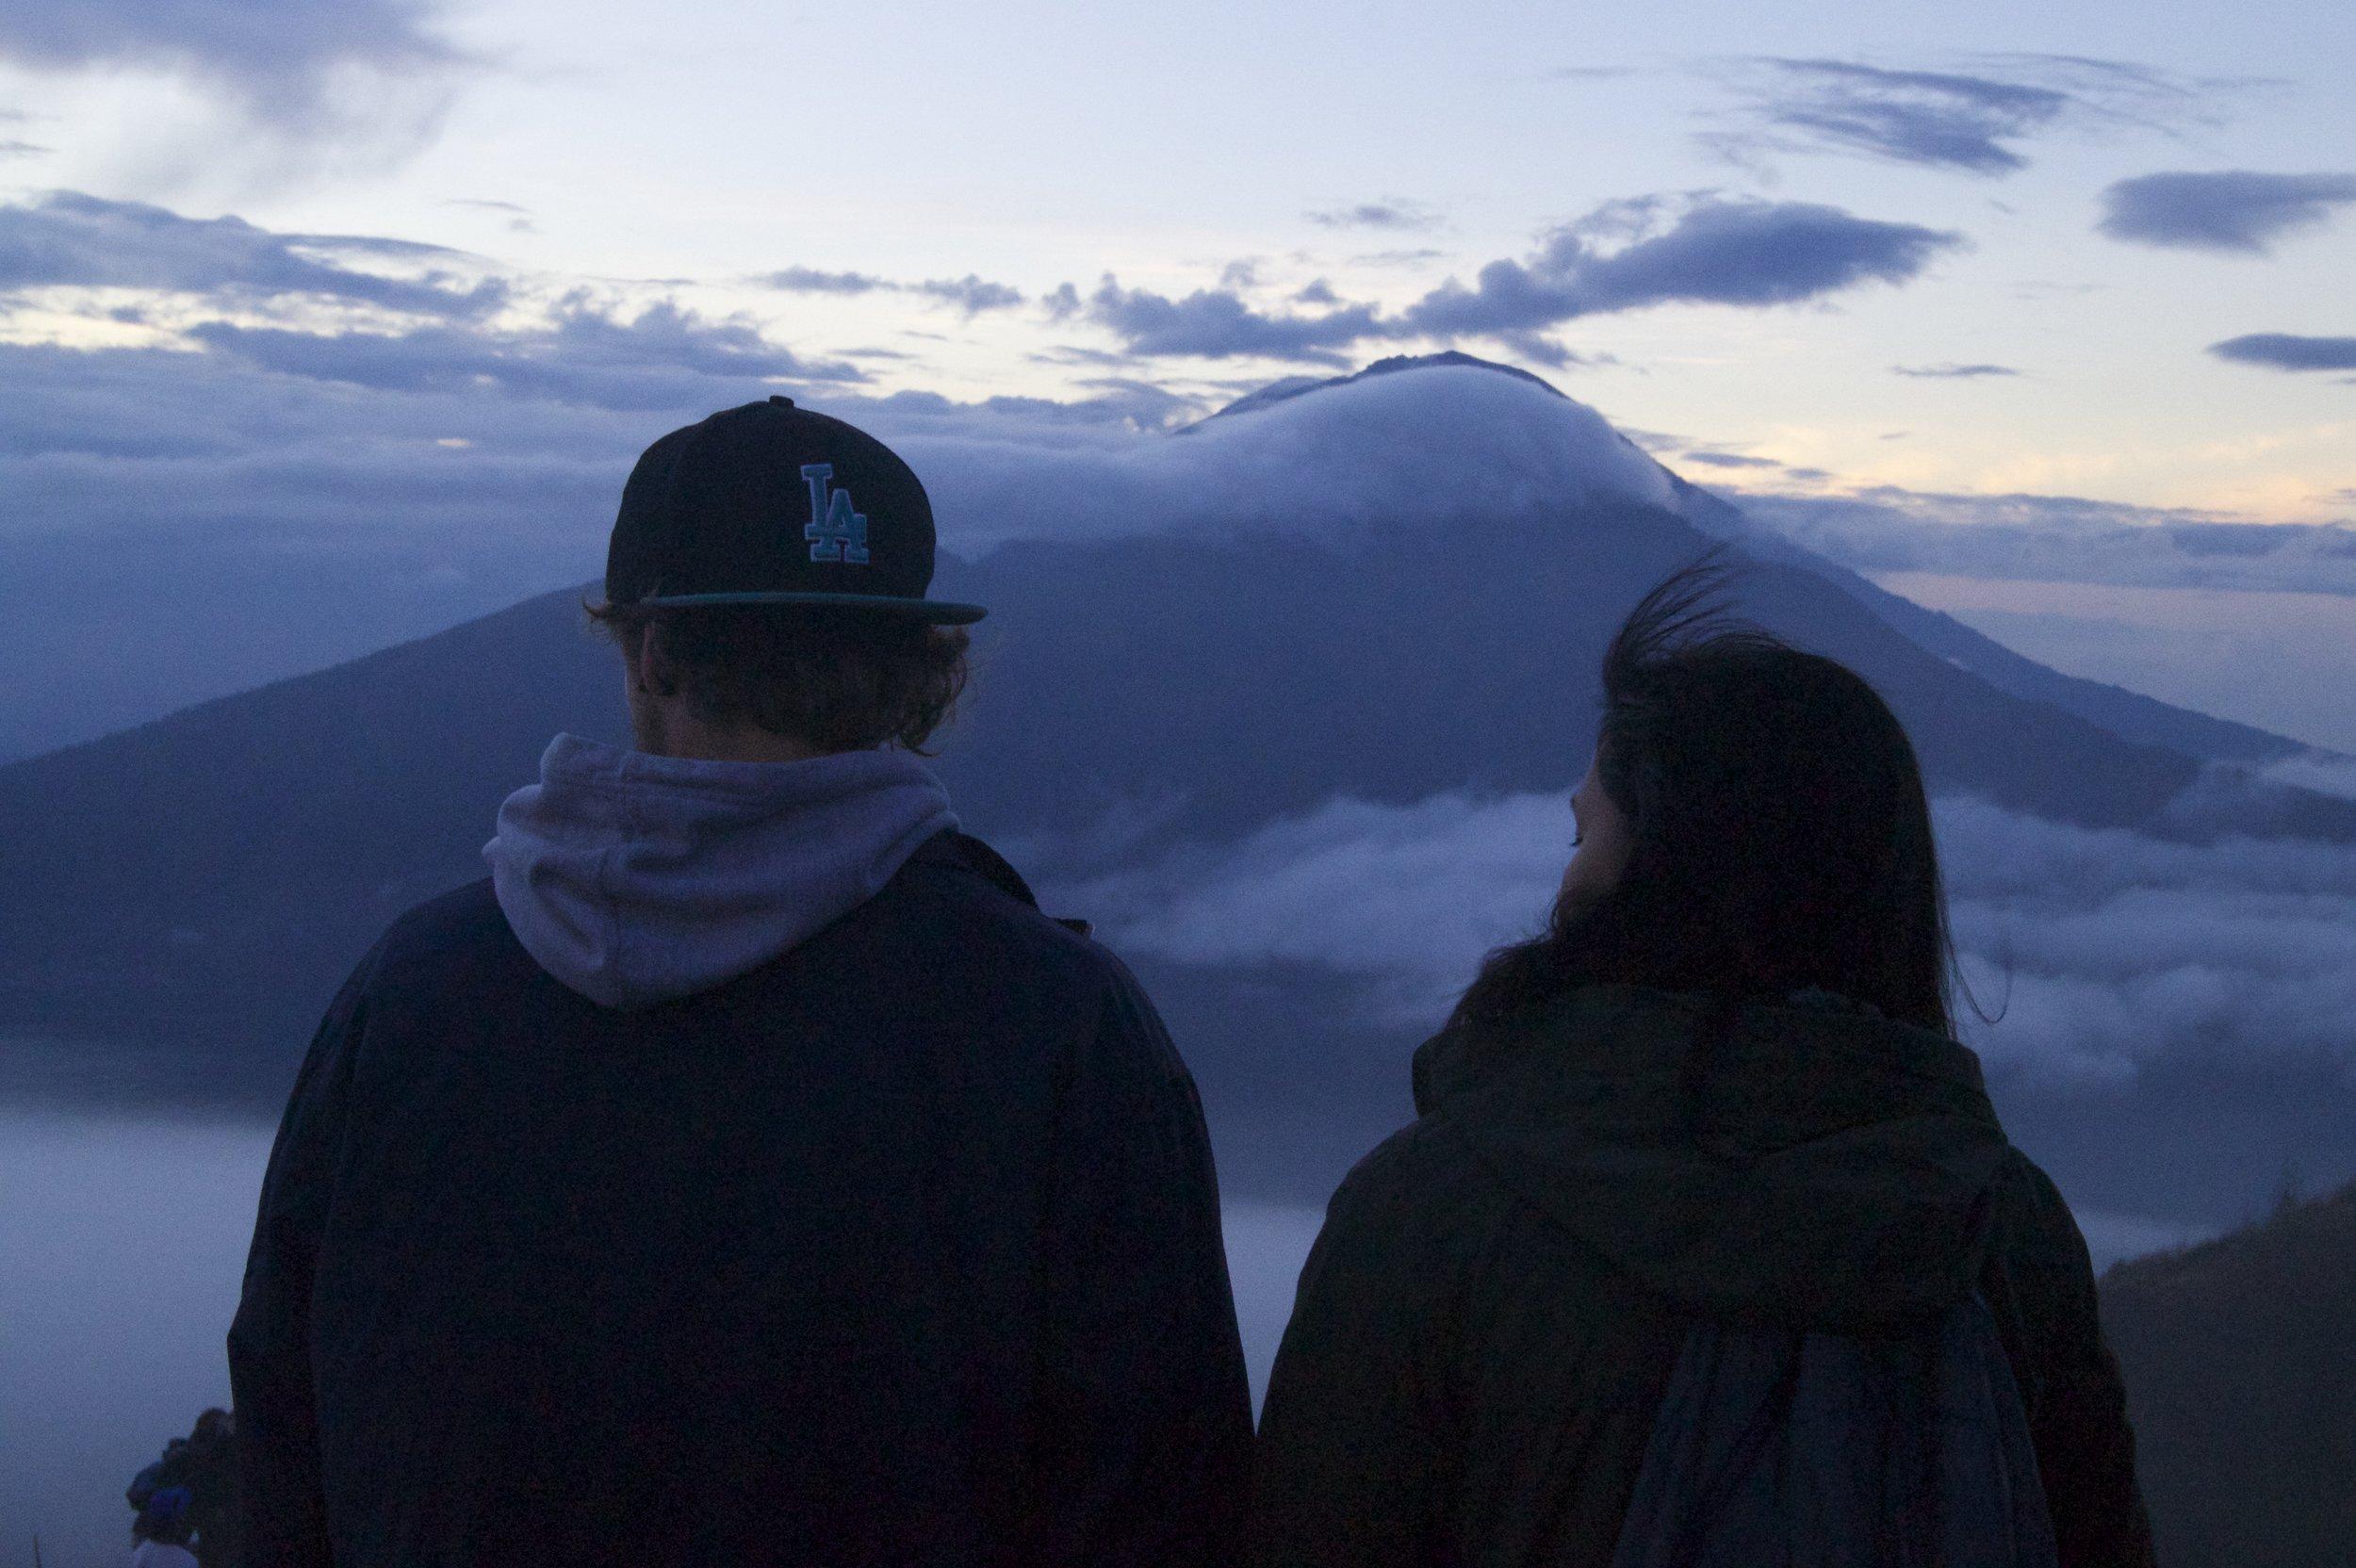 Tom and Hani Mount Batur Sunrise Hike, Bali, illumelation.com